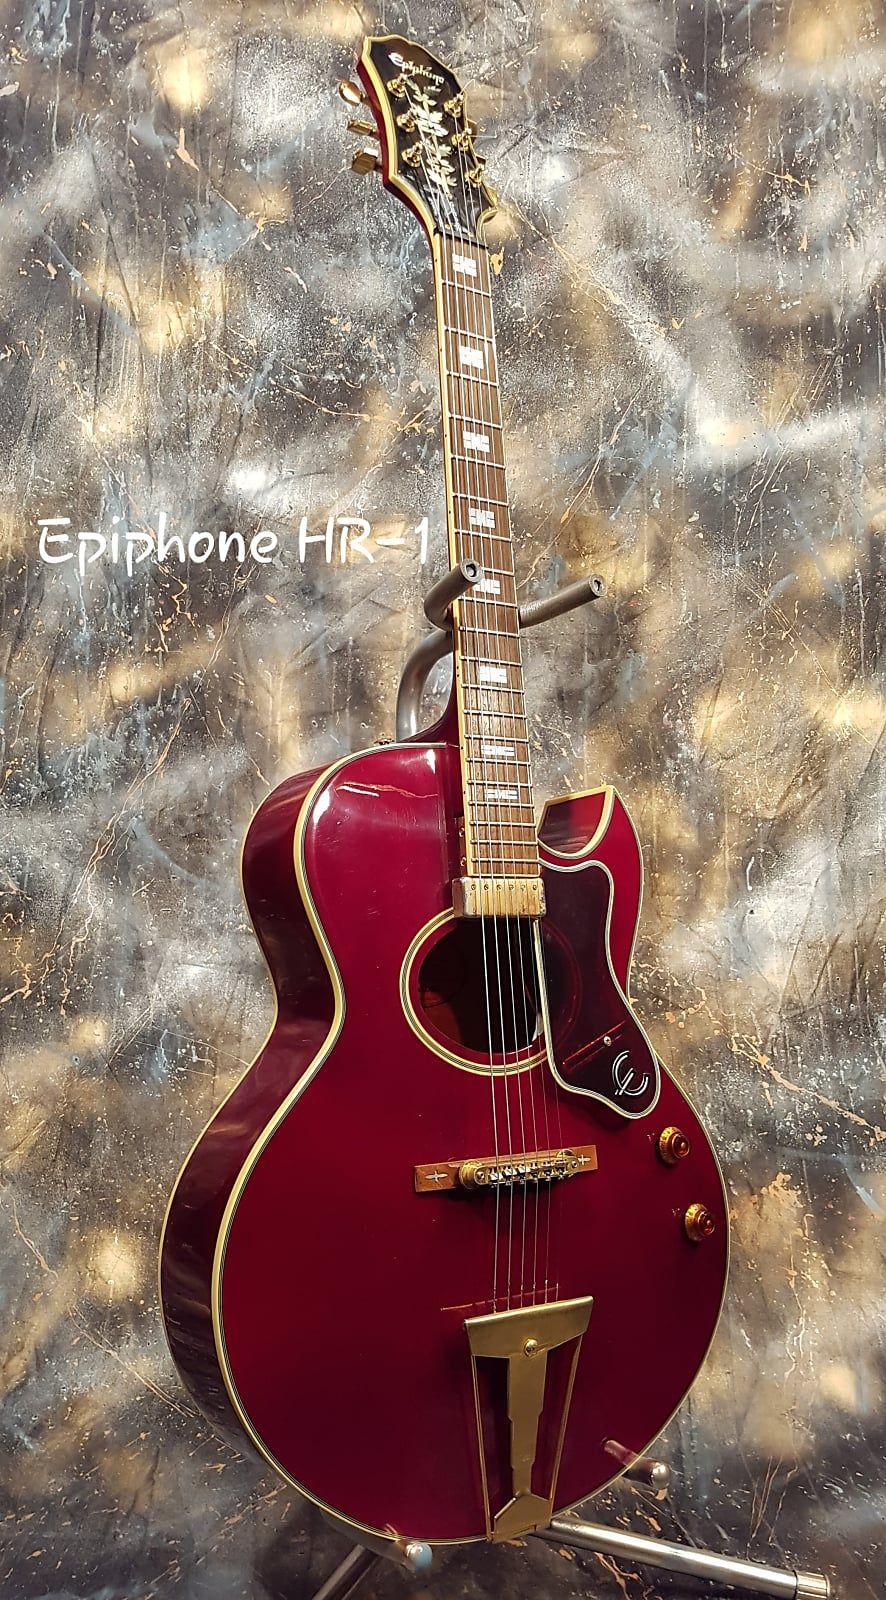 Epiphone Howard Roberts Hr 1 1996 Wine Red Cherry Guitar Git Reverb In 2020 Epiphone Guitar Epiphone Acoustic Guitar